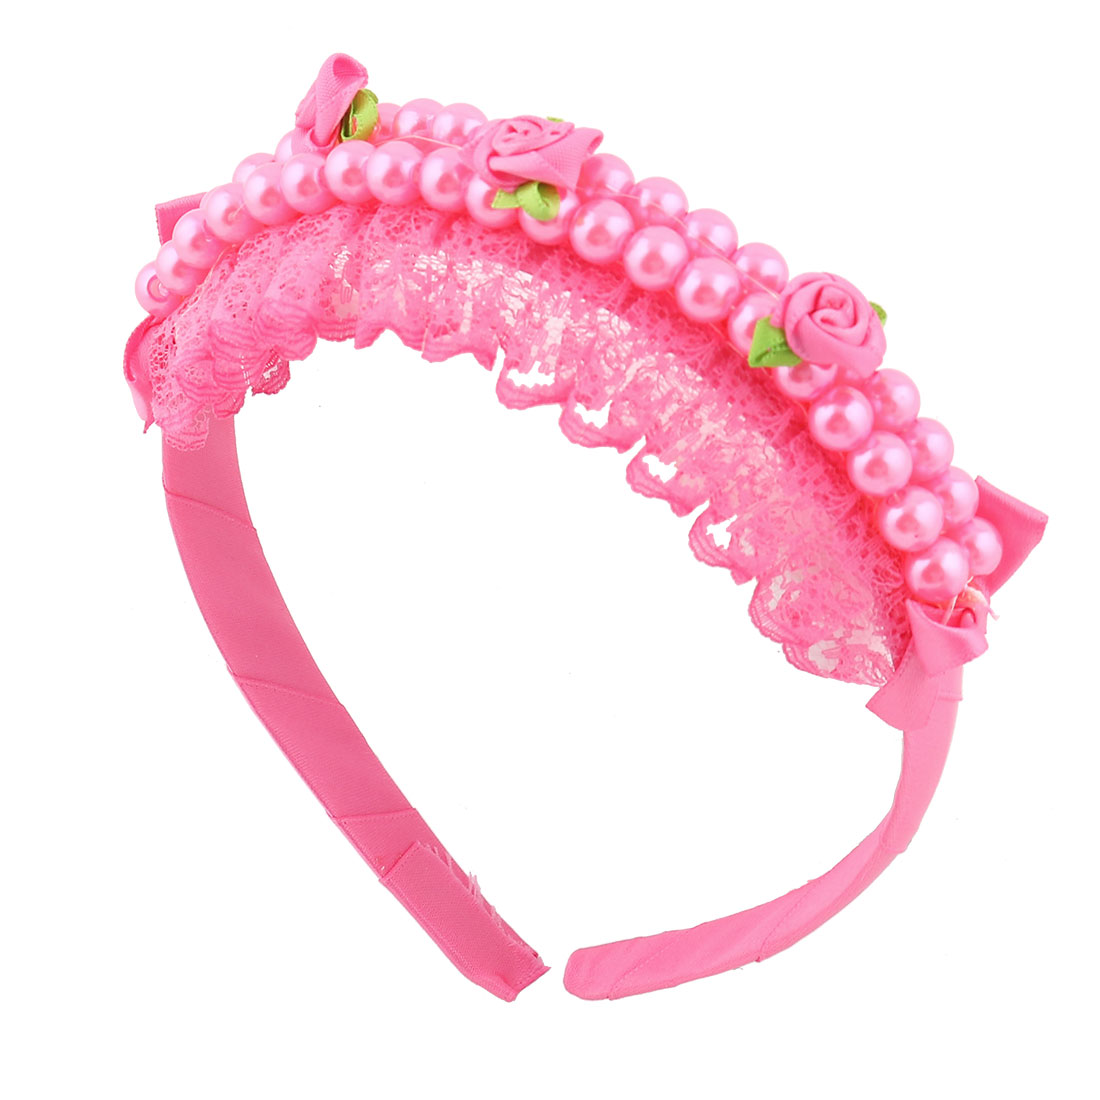 Girl Flower Imitation Pearl Inlaid Lace Decor Hair Band Hoop Headband Barrette Pink